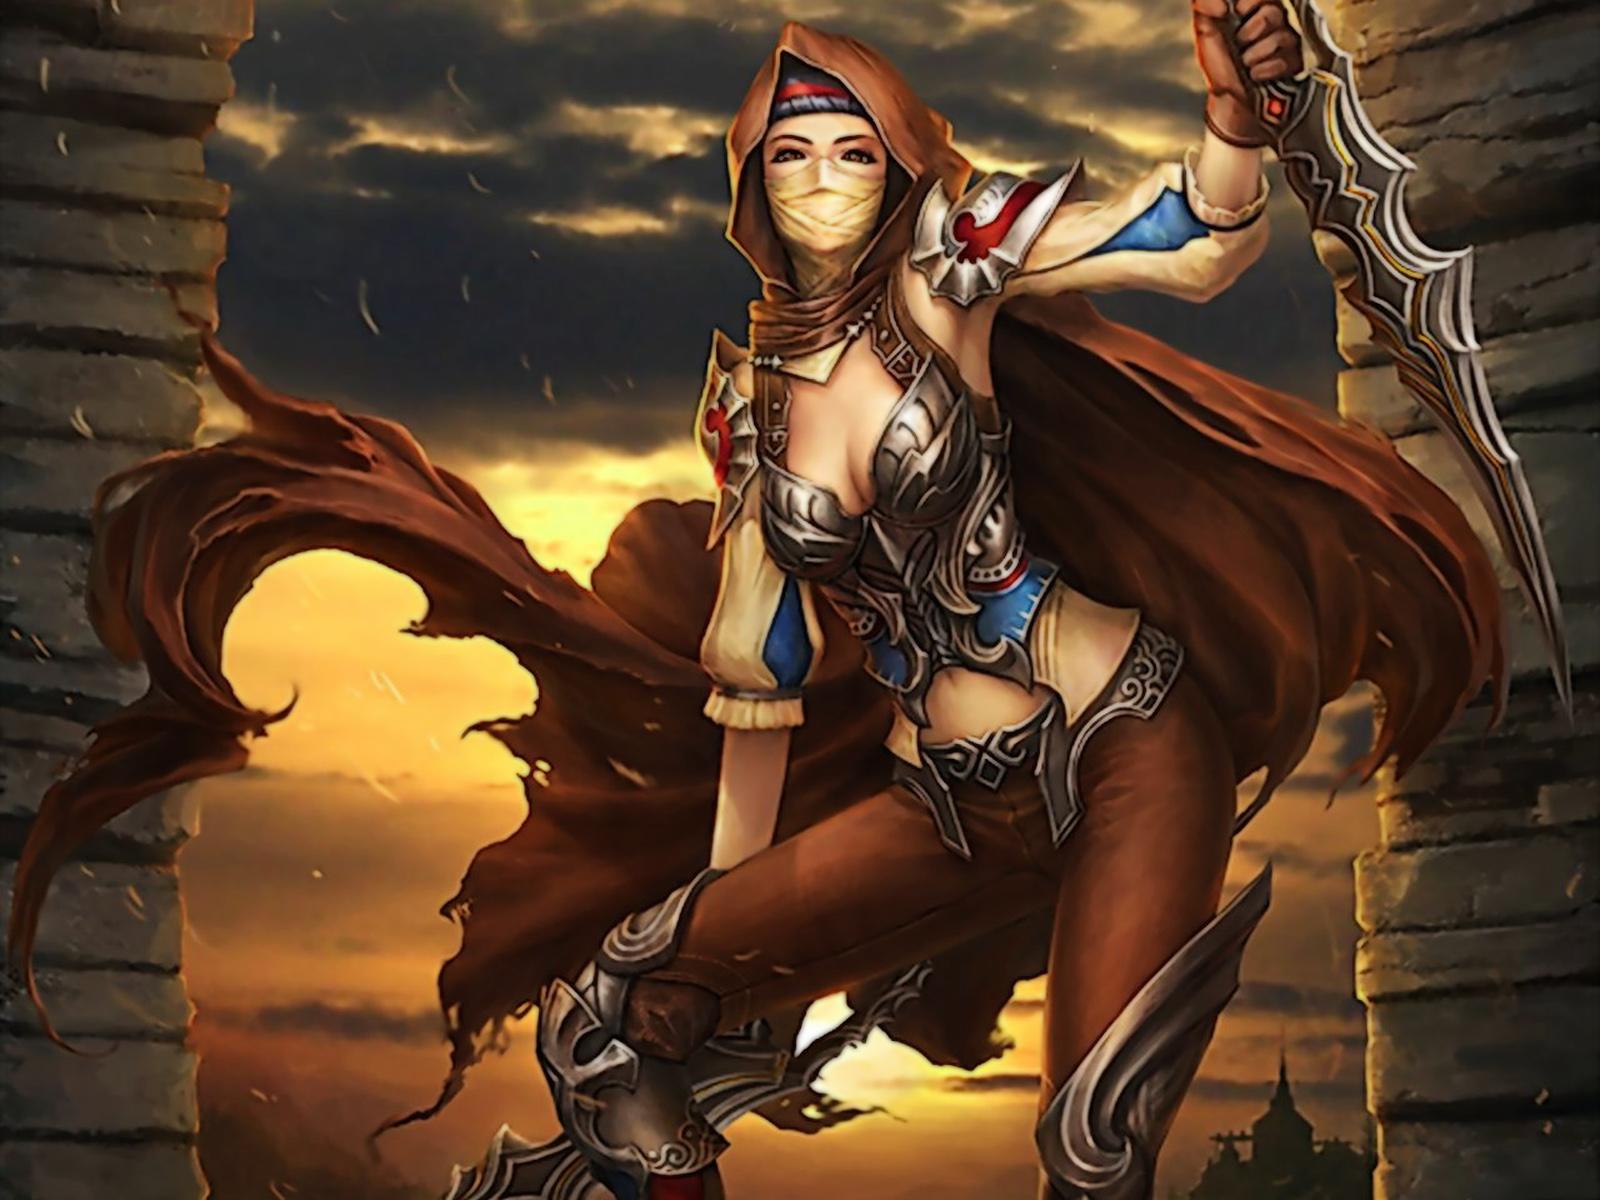 Warrior Women Wallpapers Hot babes Backgrounds Warrior Women Fantasy 1600x1200